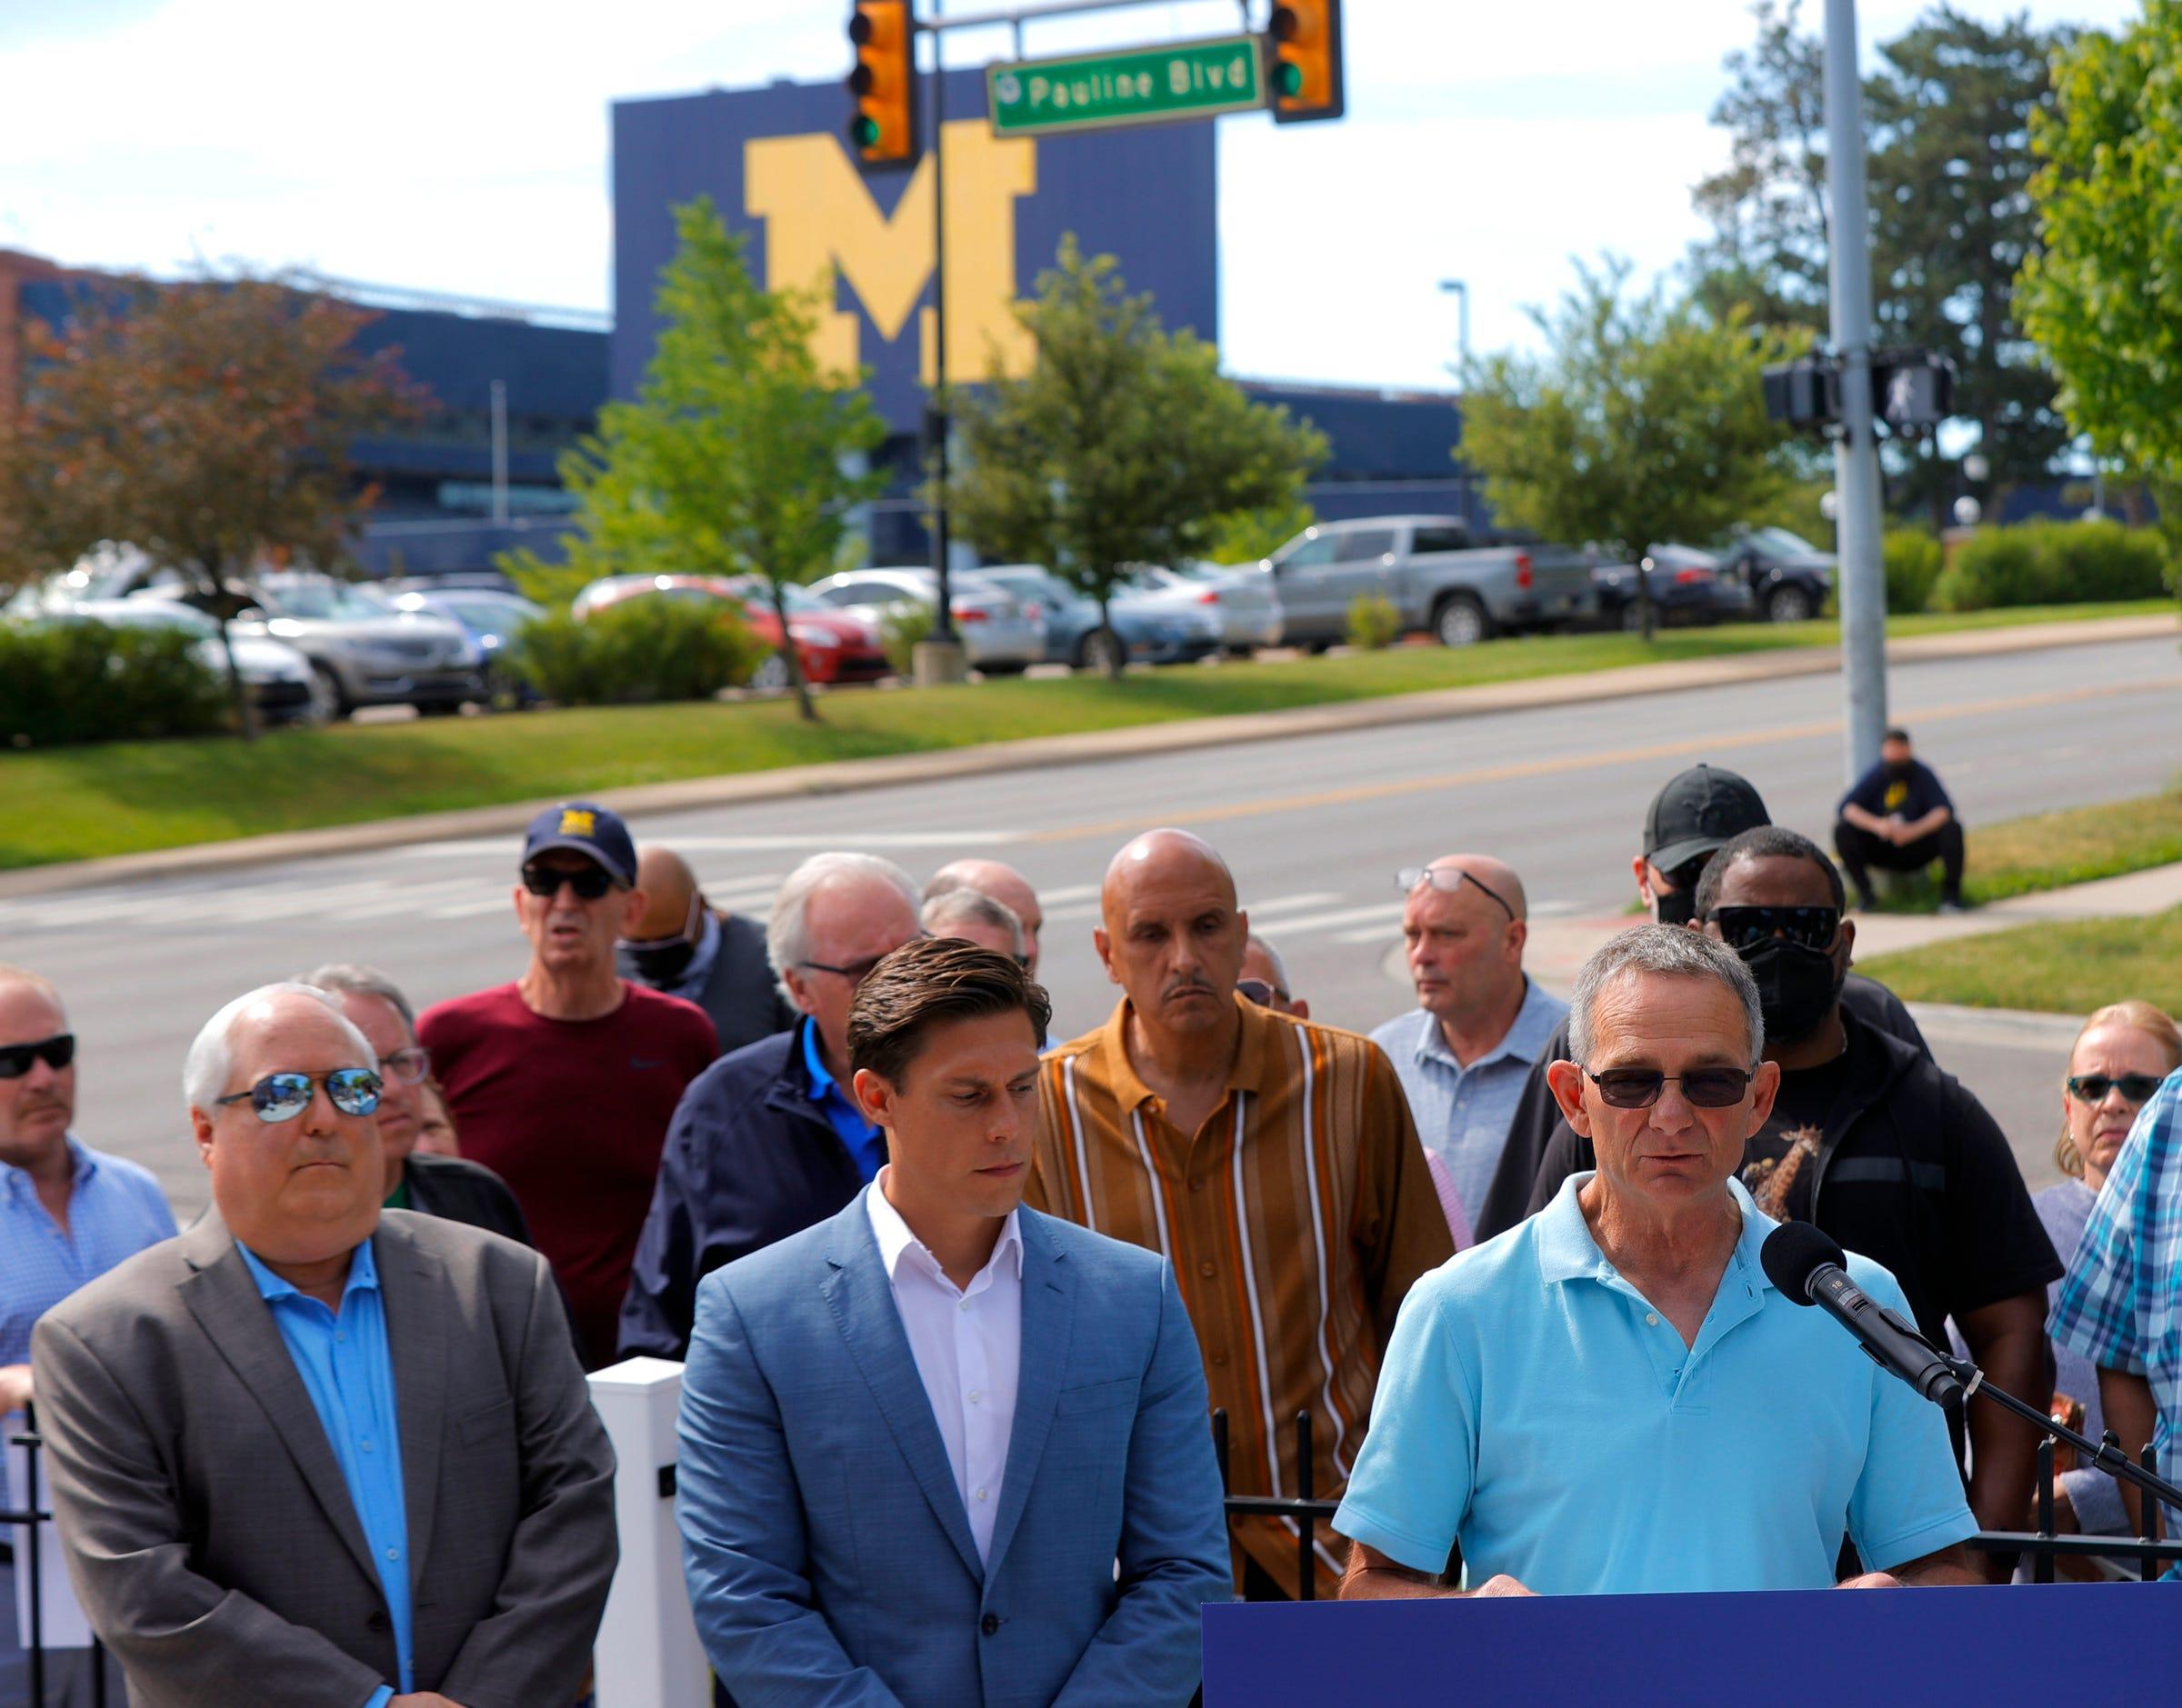 Opinion: Talk of Bo Schembechler's Michigan legacy overlooks real villain: Robert Anderson